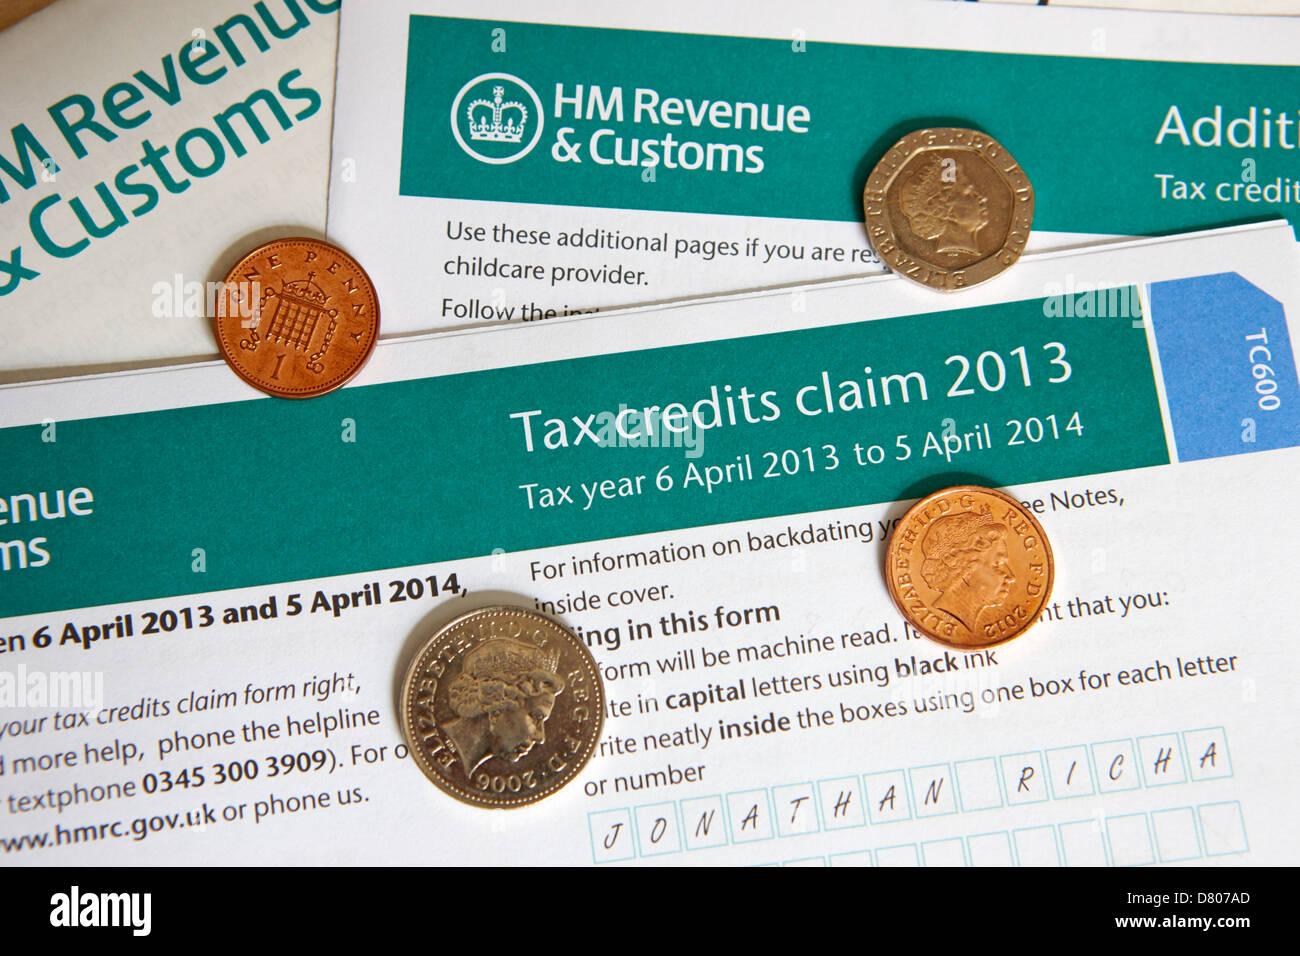 hmrc tax credits claim form - Stock Image